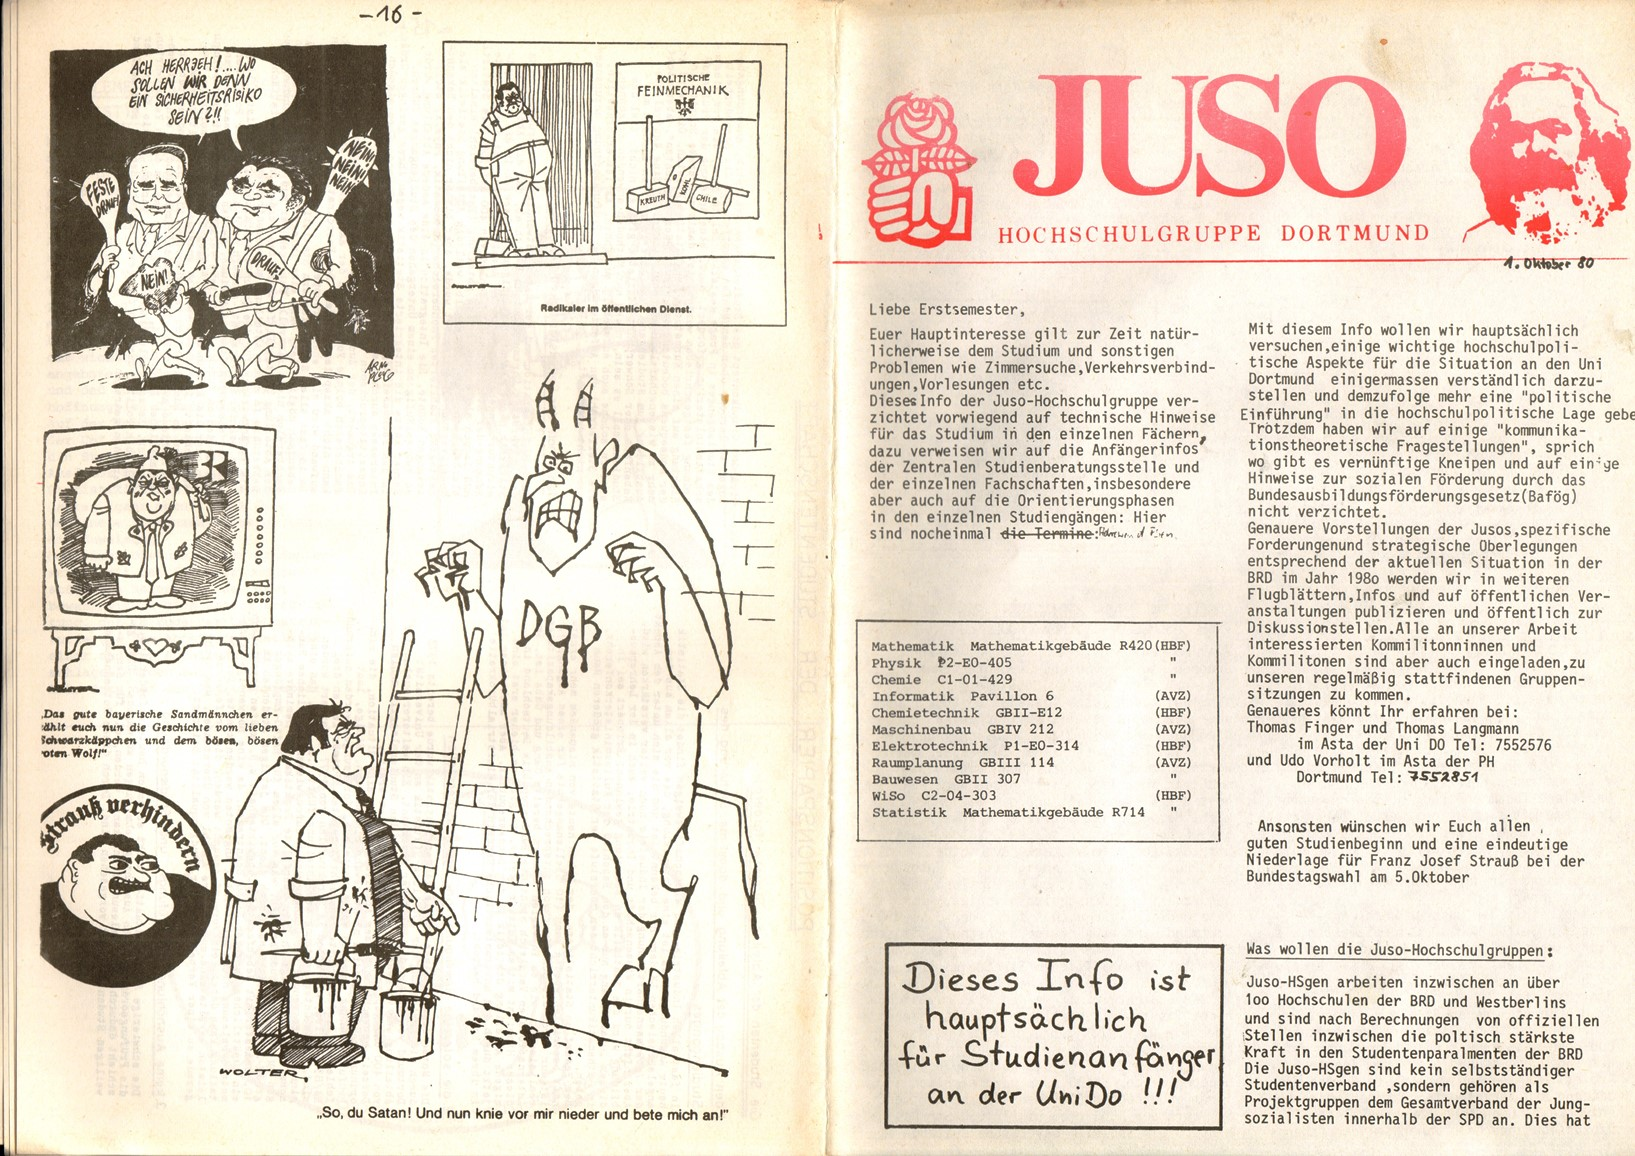 Dortmund_JUSO_HSG_1980_001_01